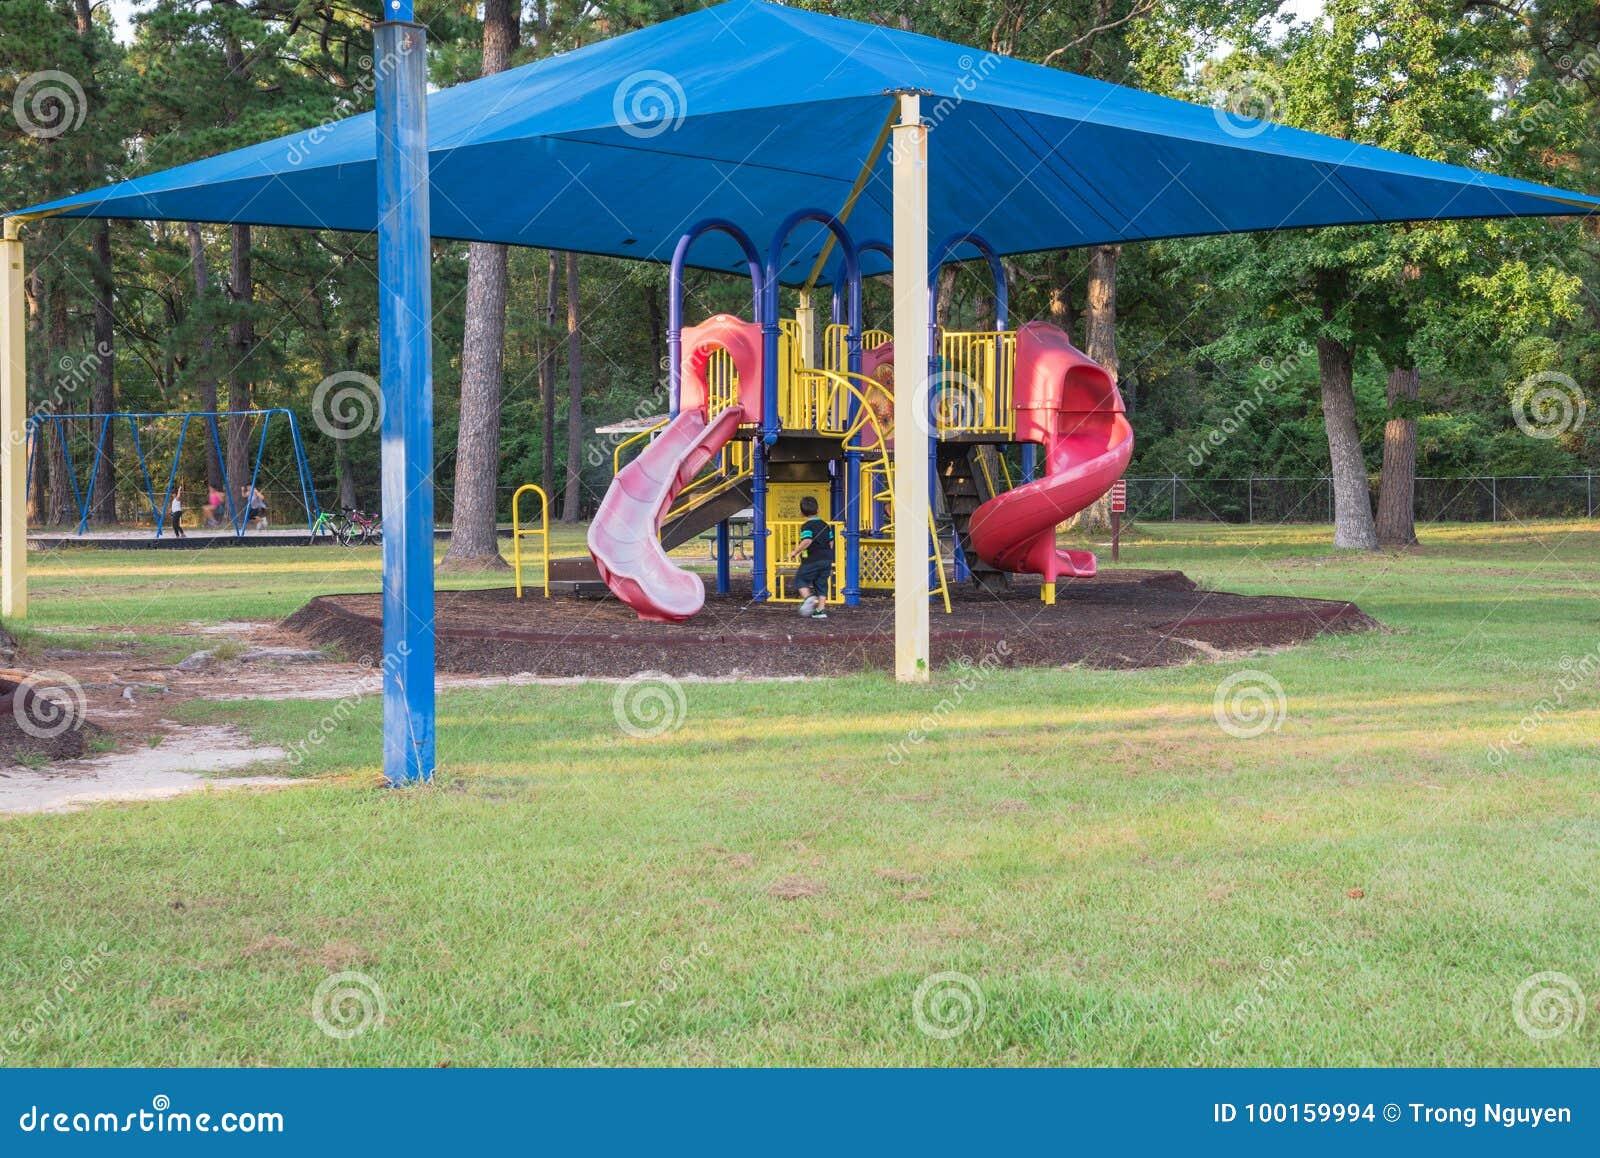 Shade Structure Playground Houston Texas Usa Stock Photo Image